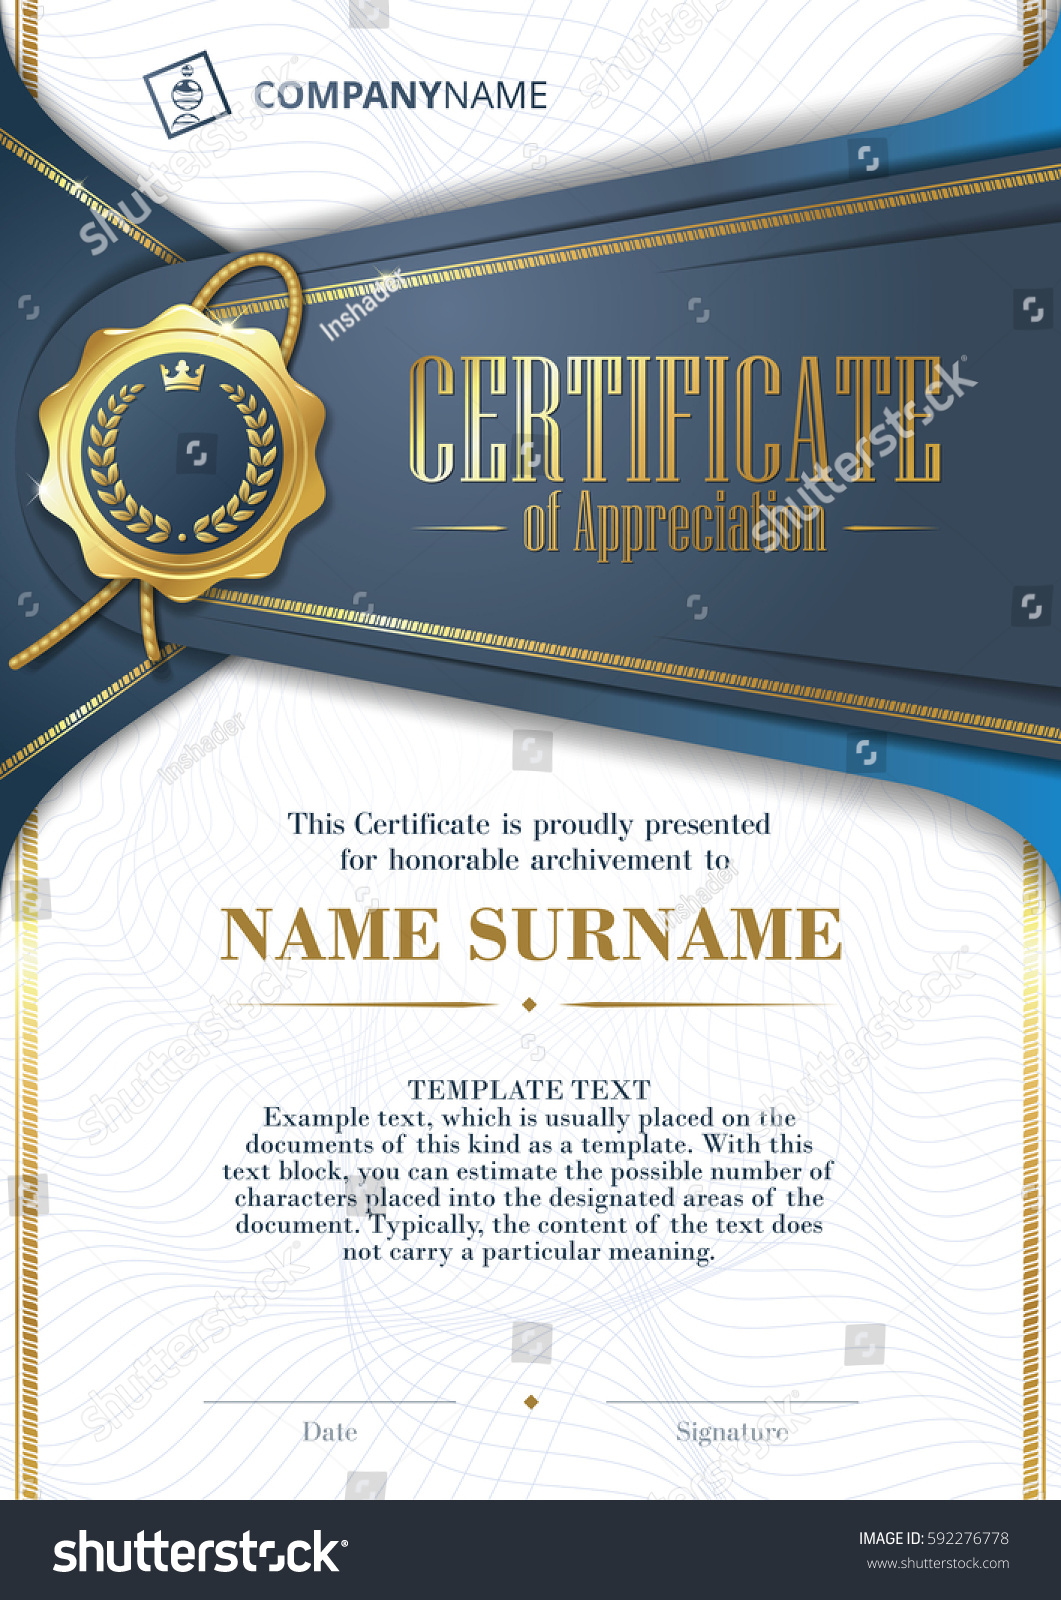 Template Certificate Appreciation Golden Badge Patterned Stock ...